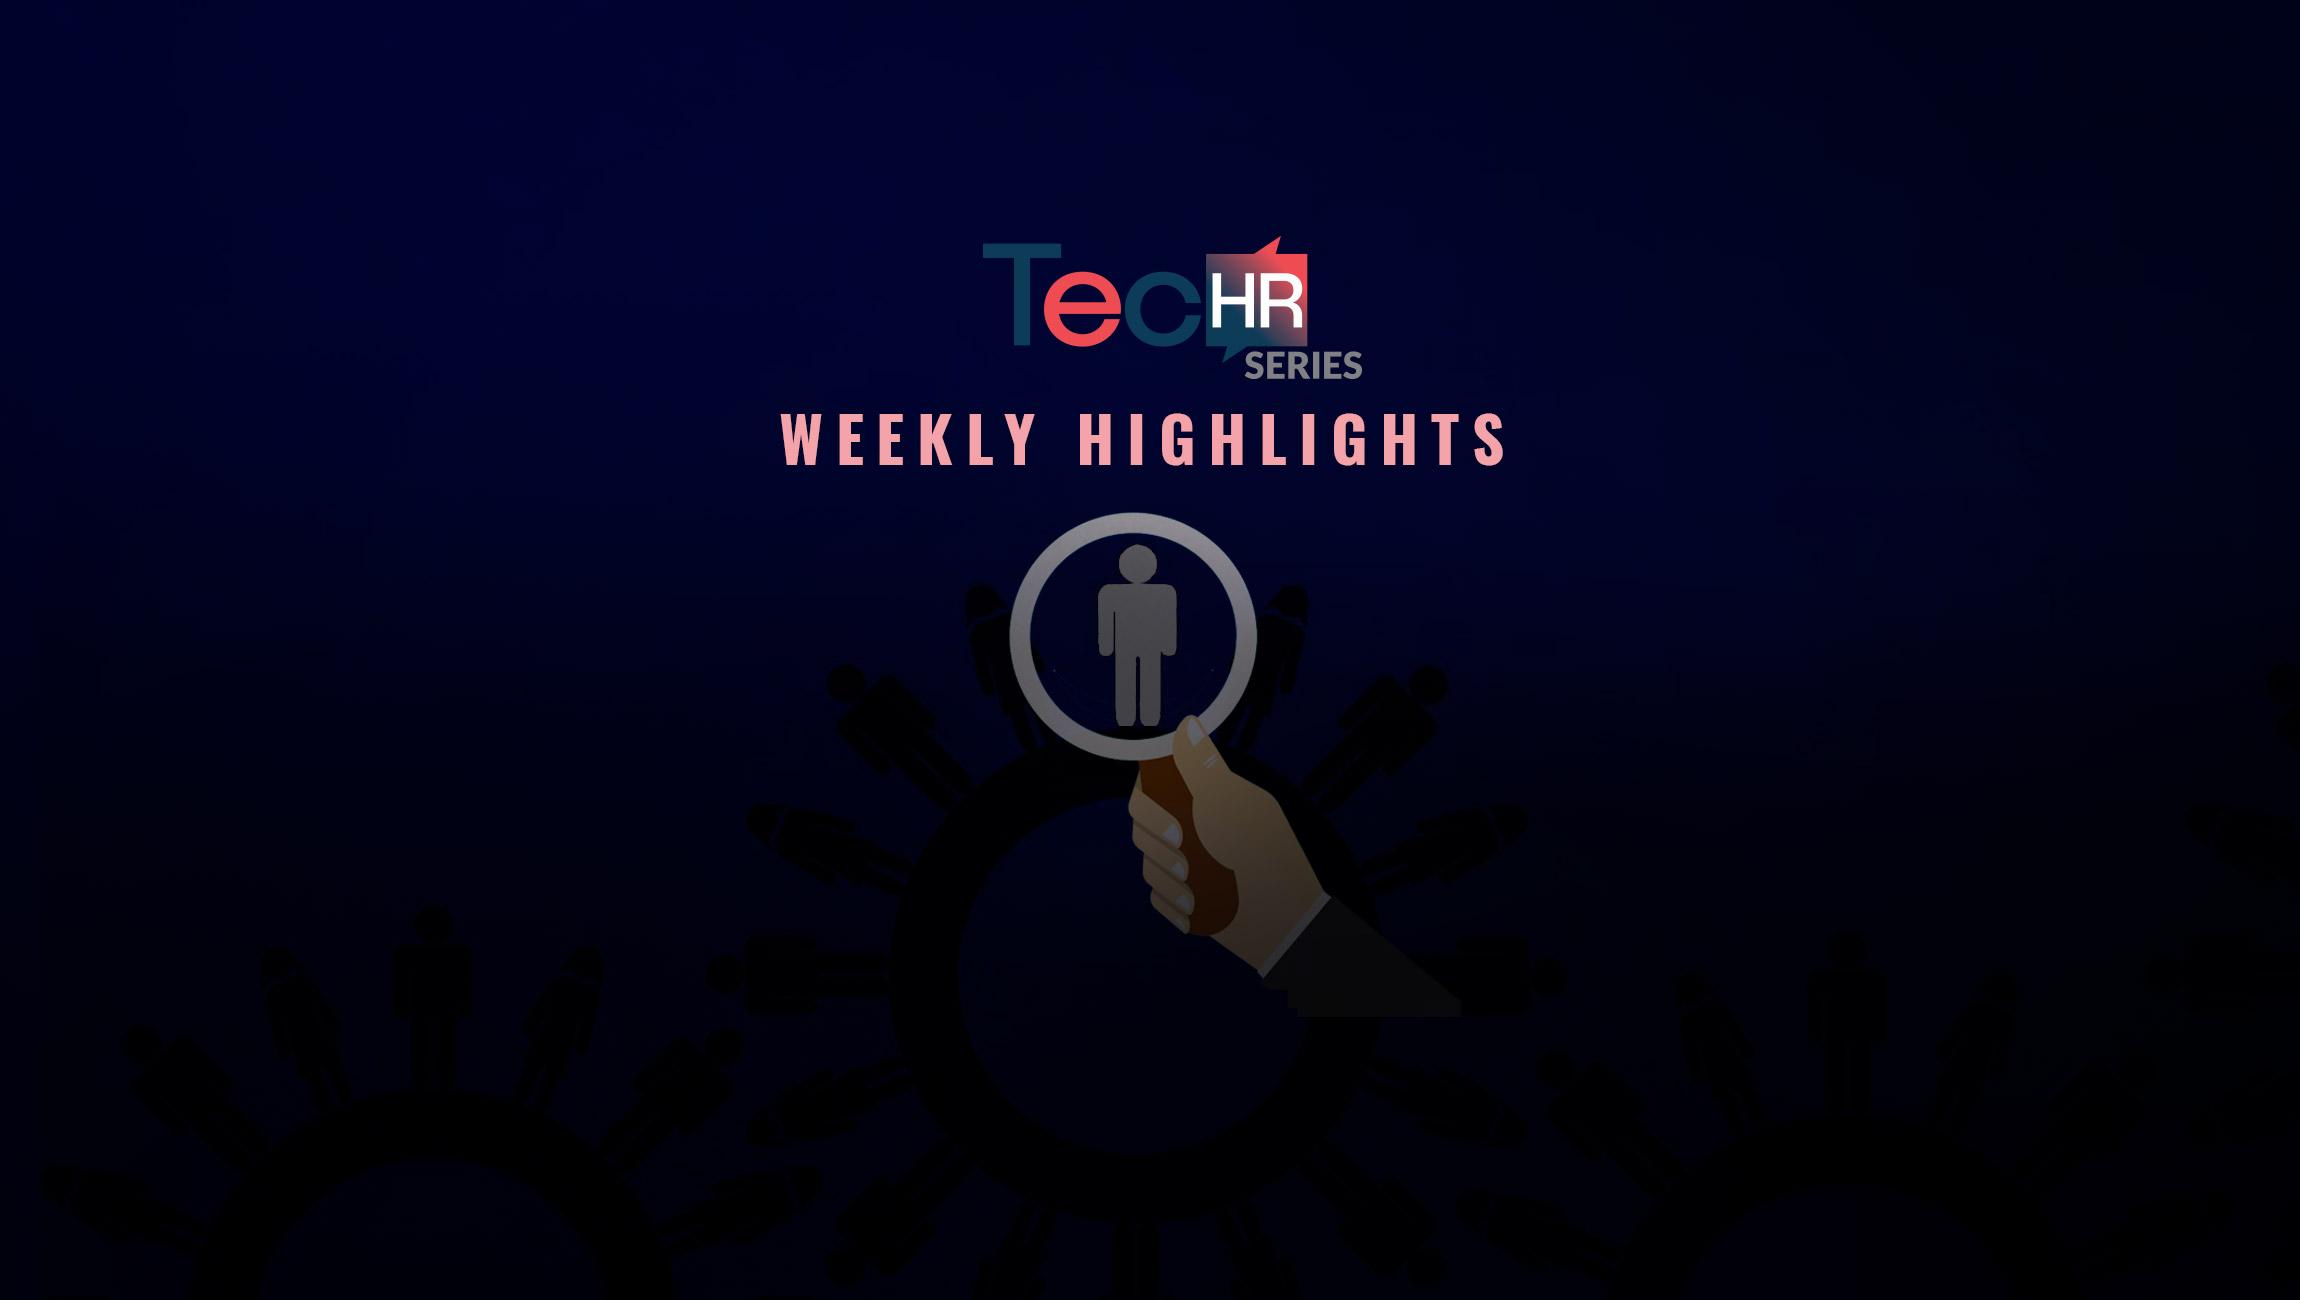 TecHR Round-up 27th January 2020